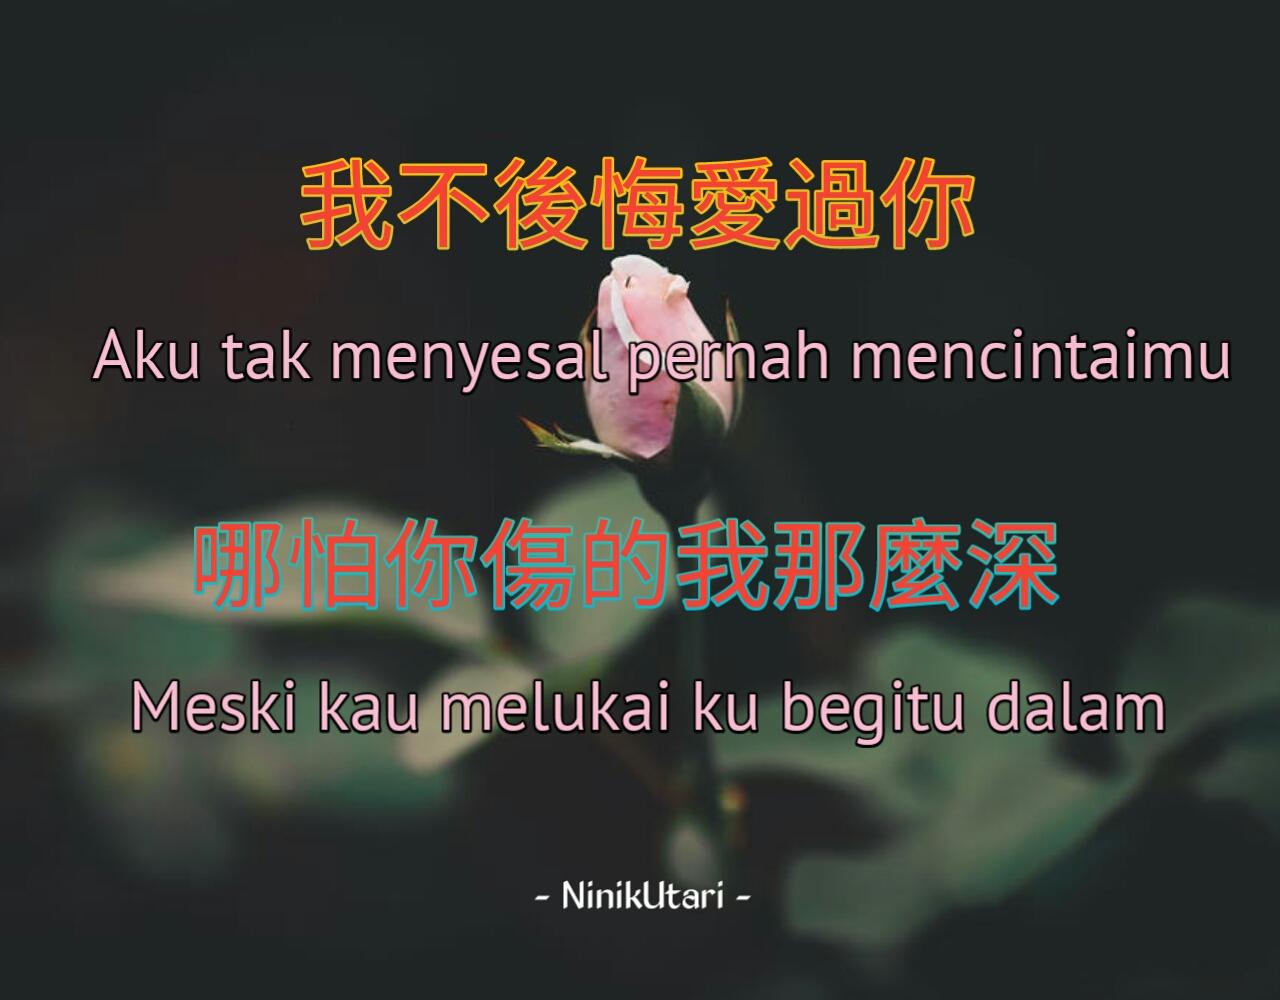 Kalimat Sedih Mengungkapkan Perasaan Hati Dalam Bahasa Mandarin Belajar Mandarin